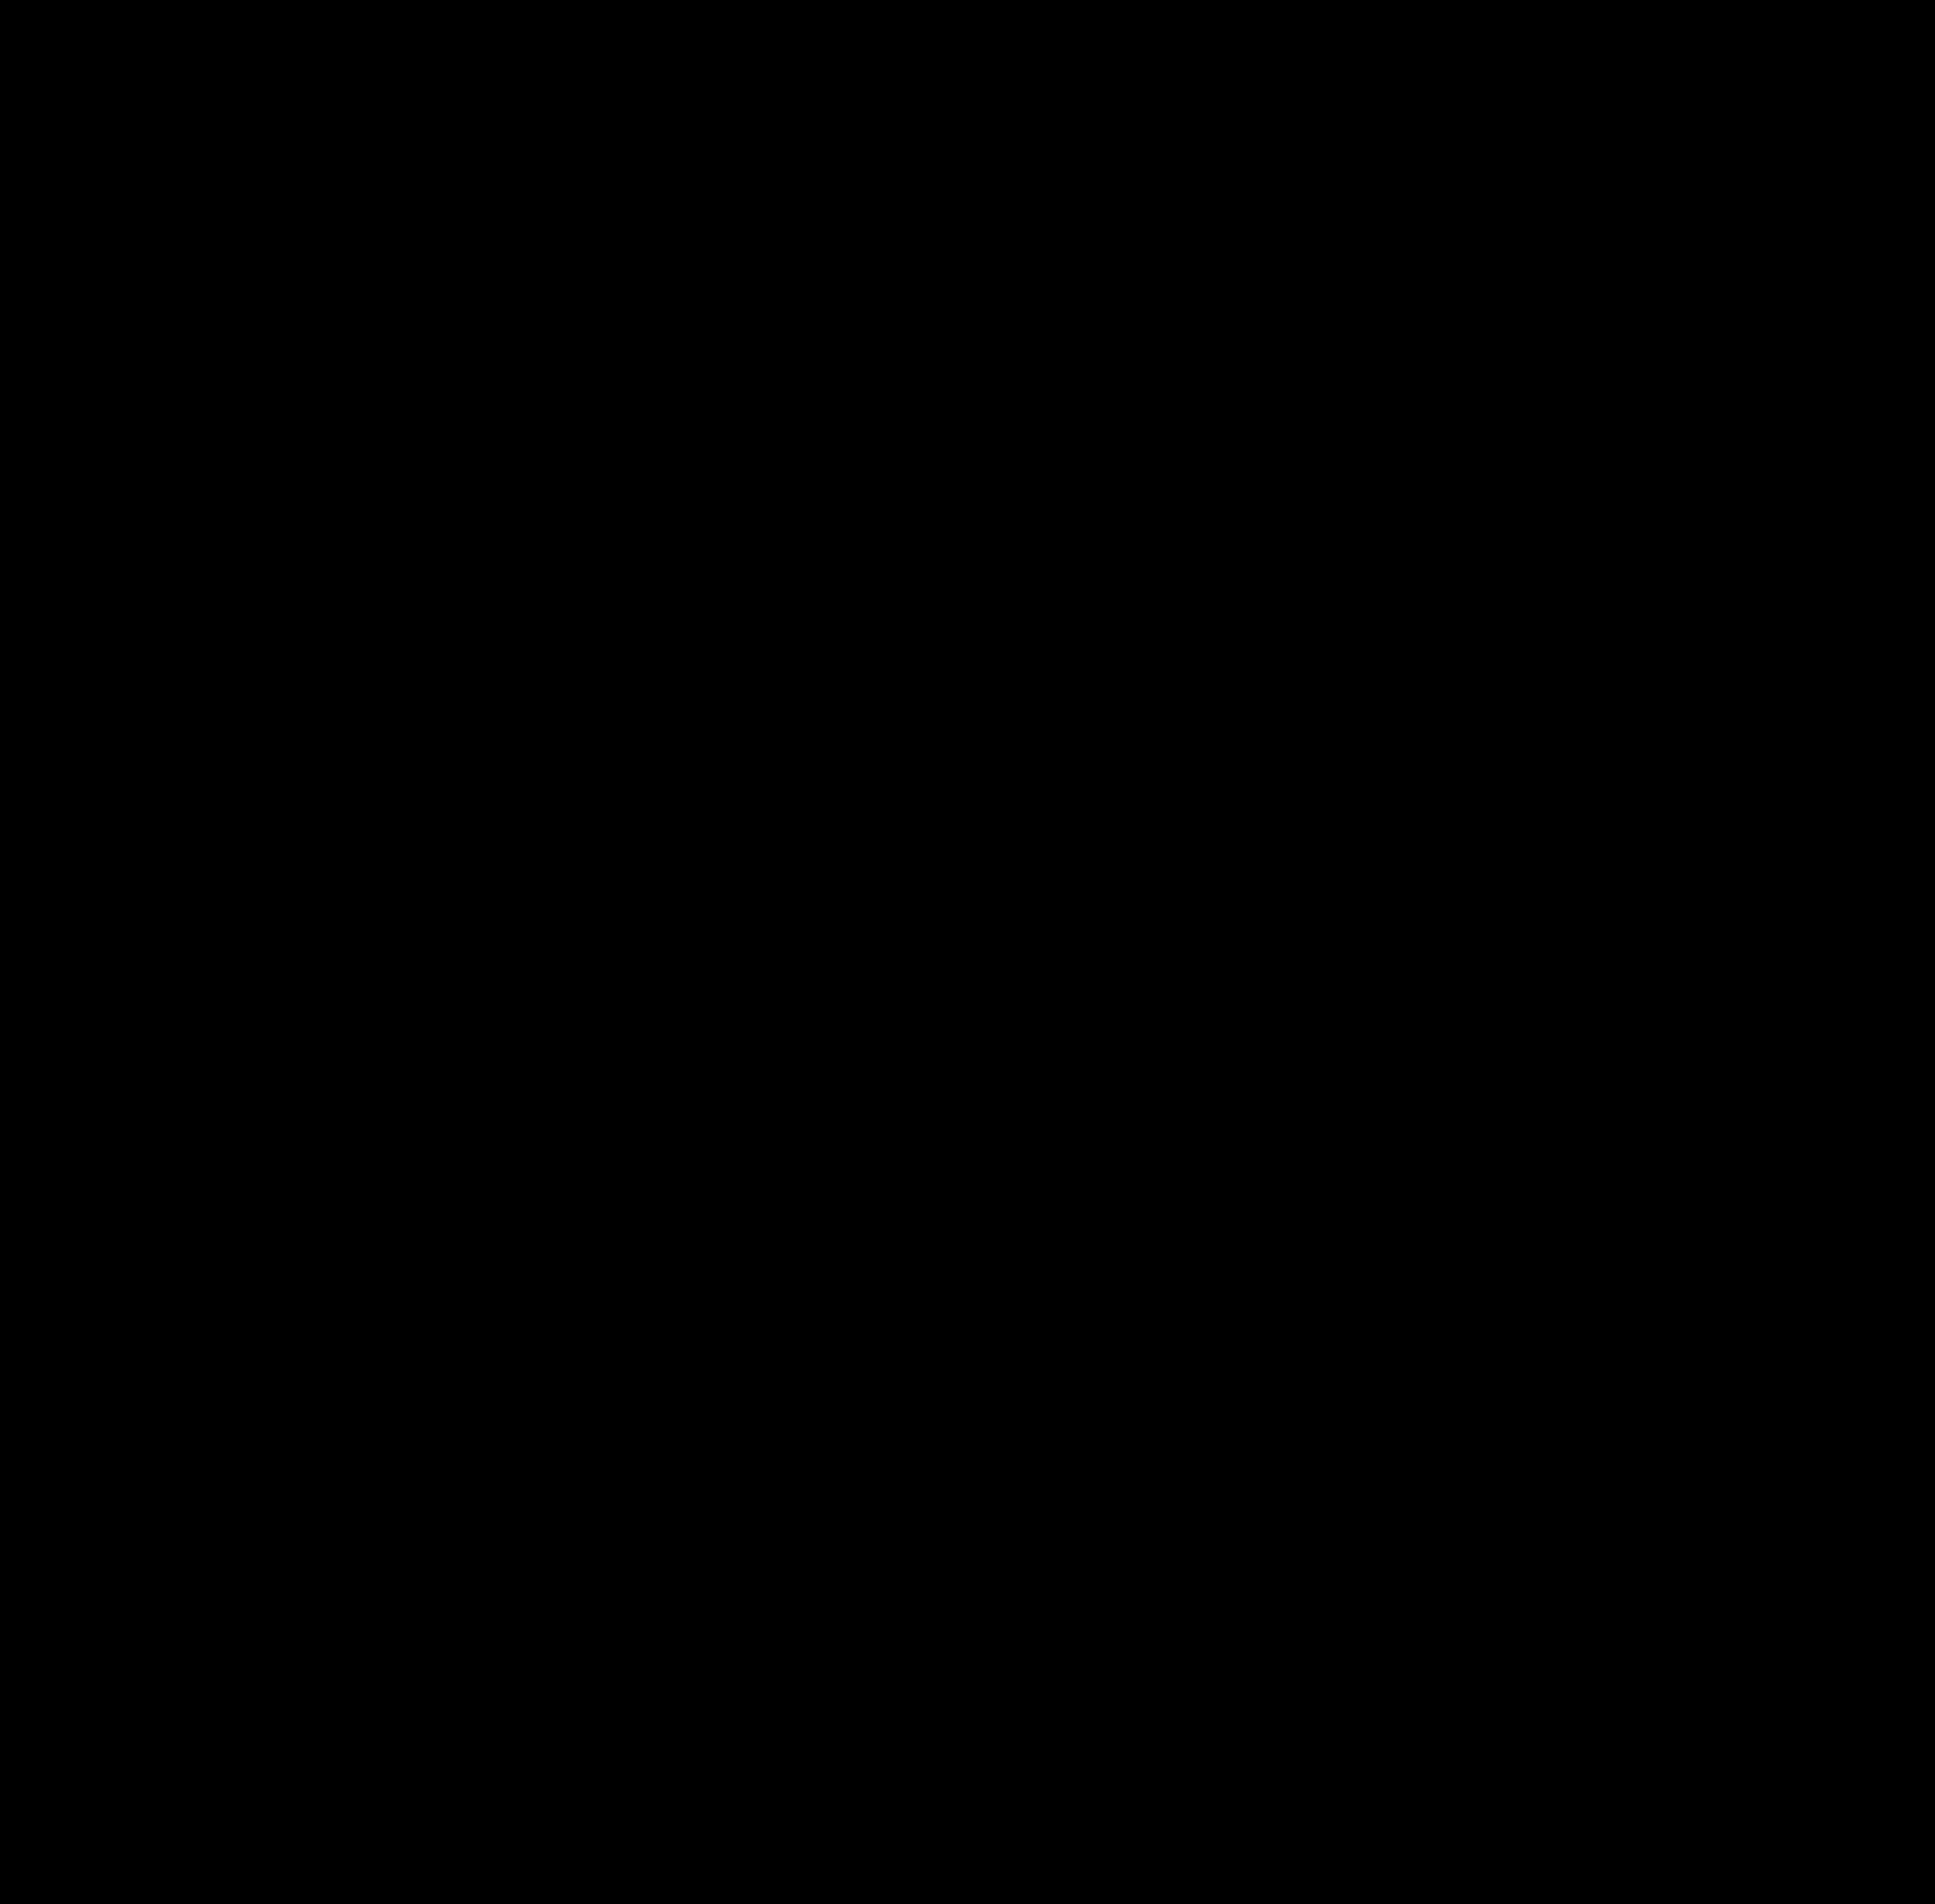 Mango clipart logo Election SVG Symbol File:Indian Commons